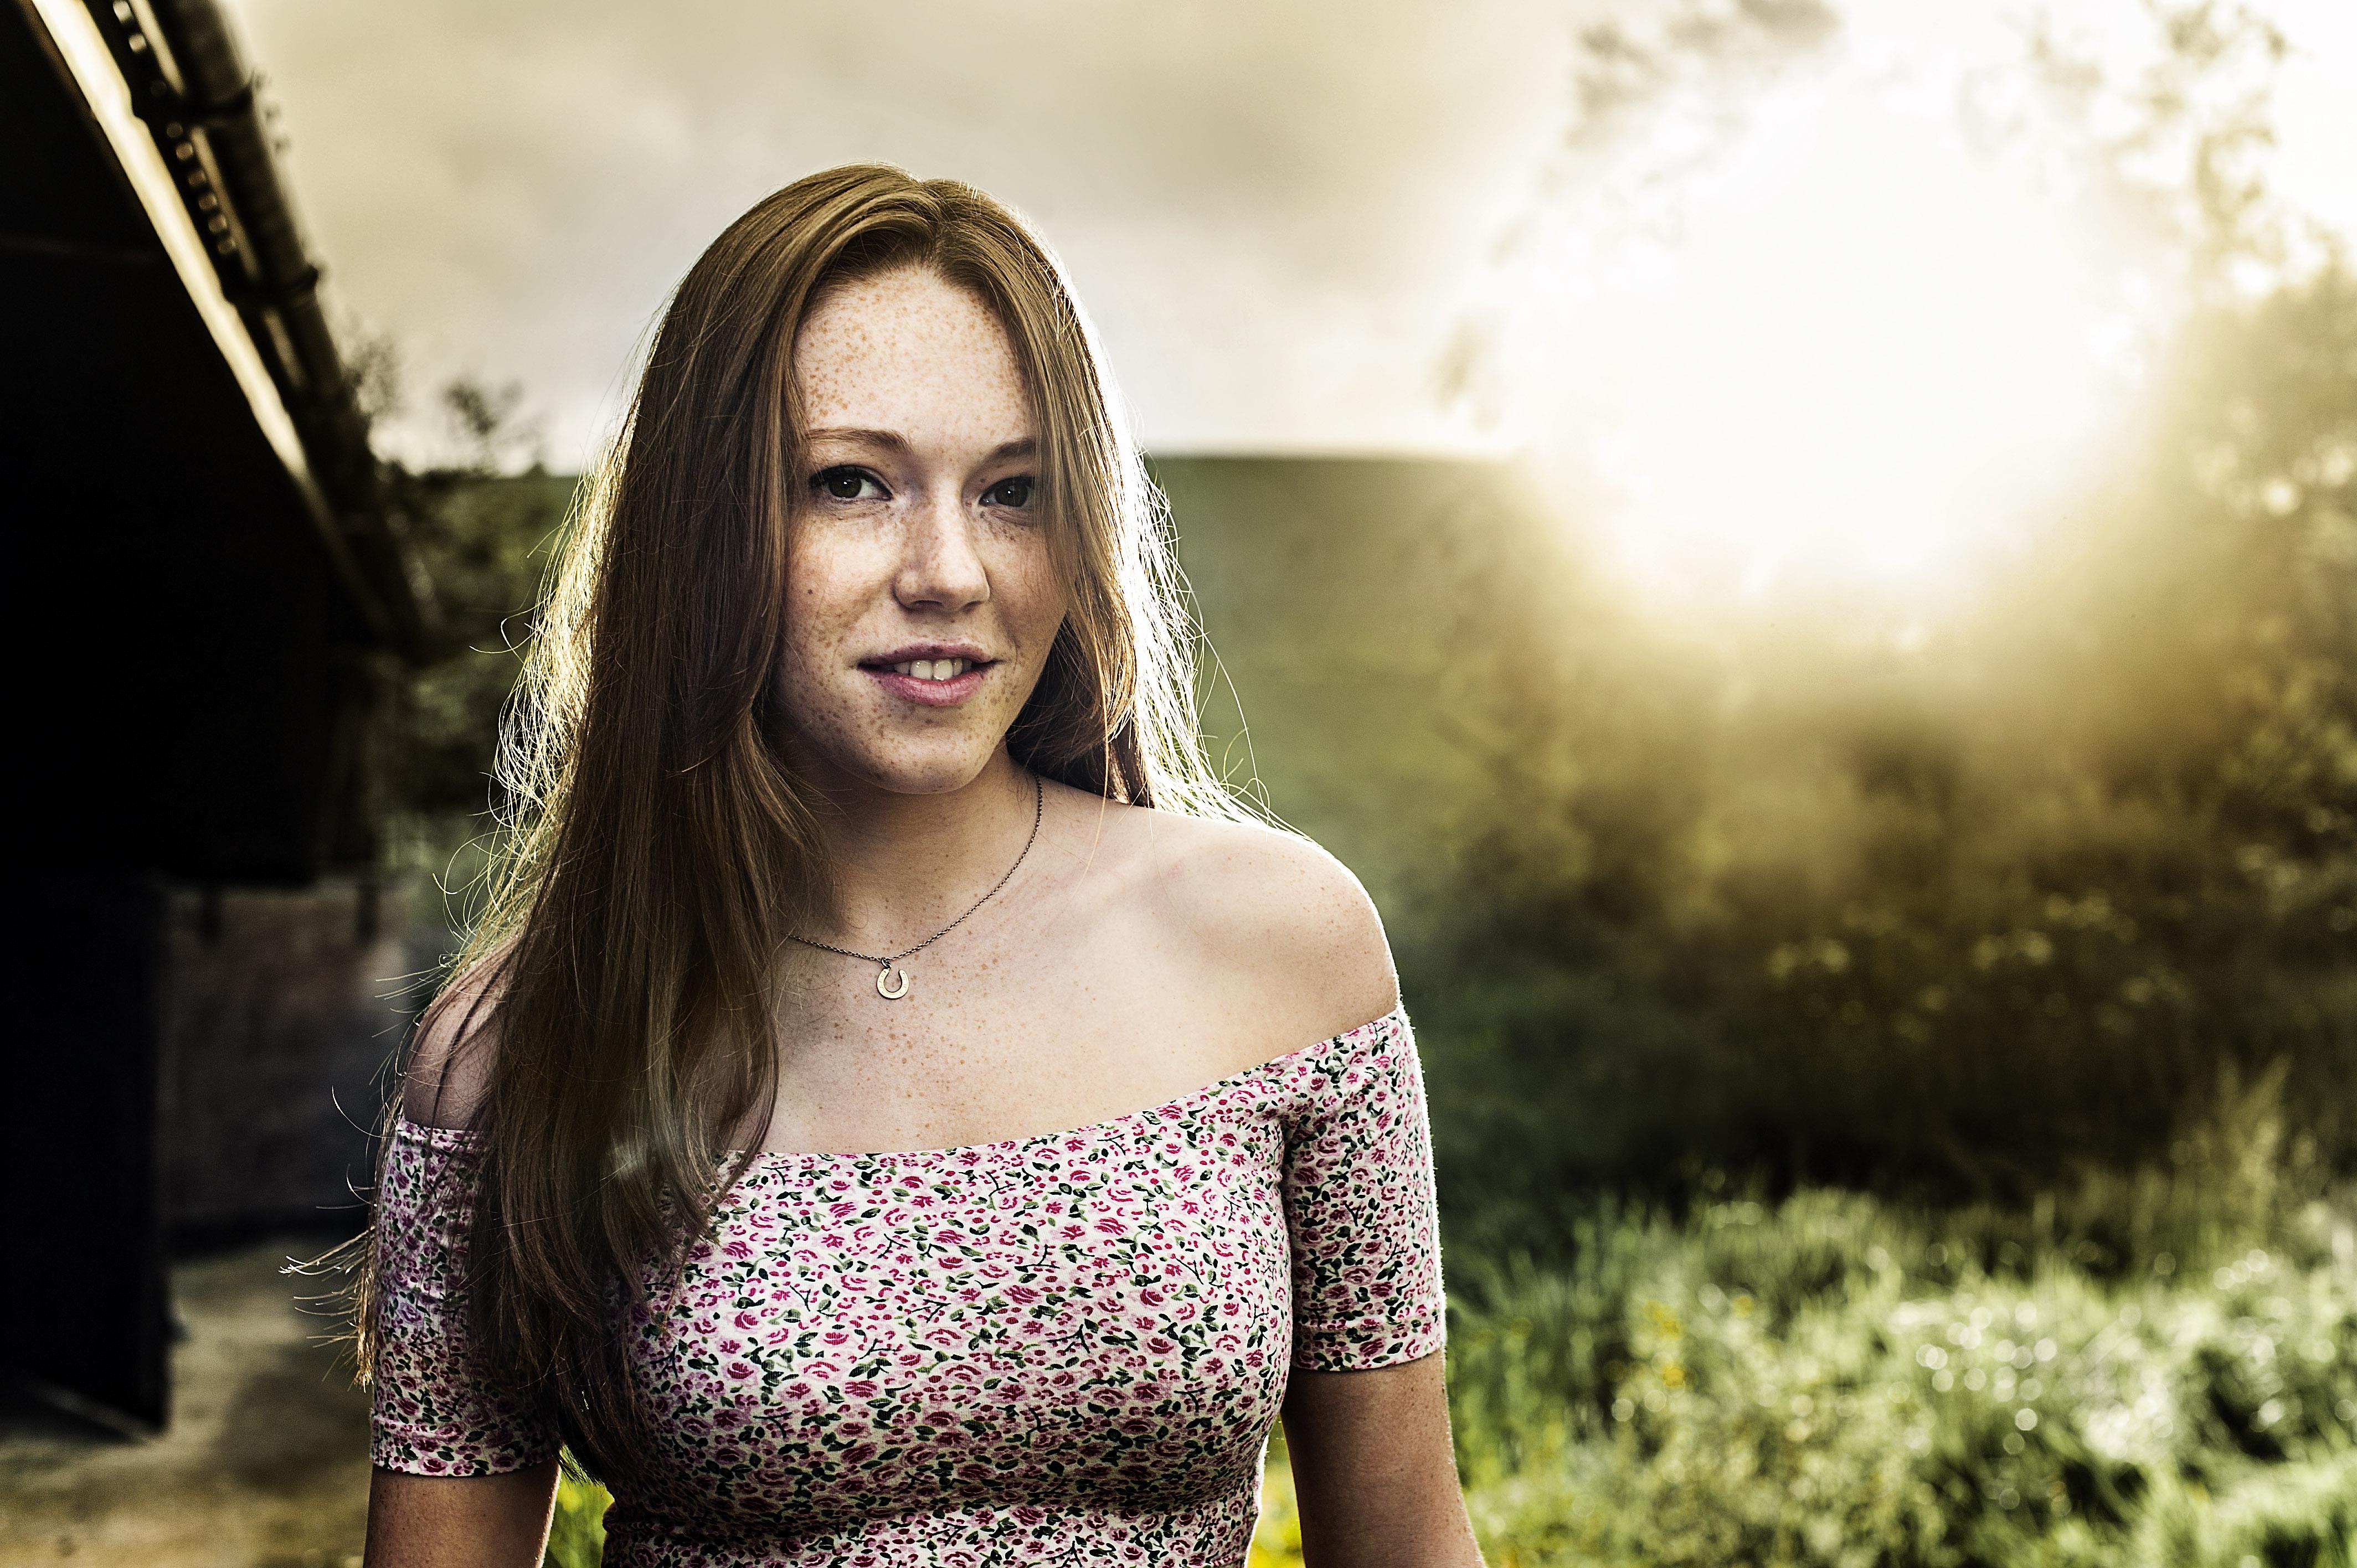 charlotte spencer age